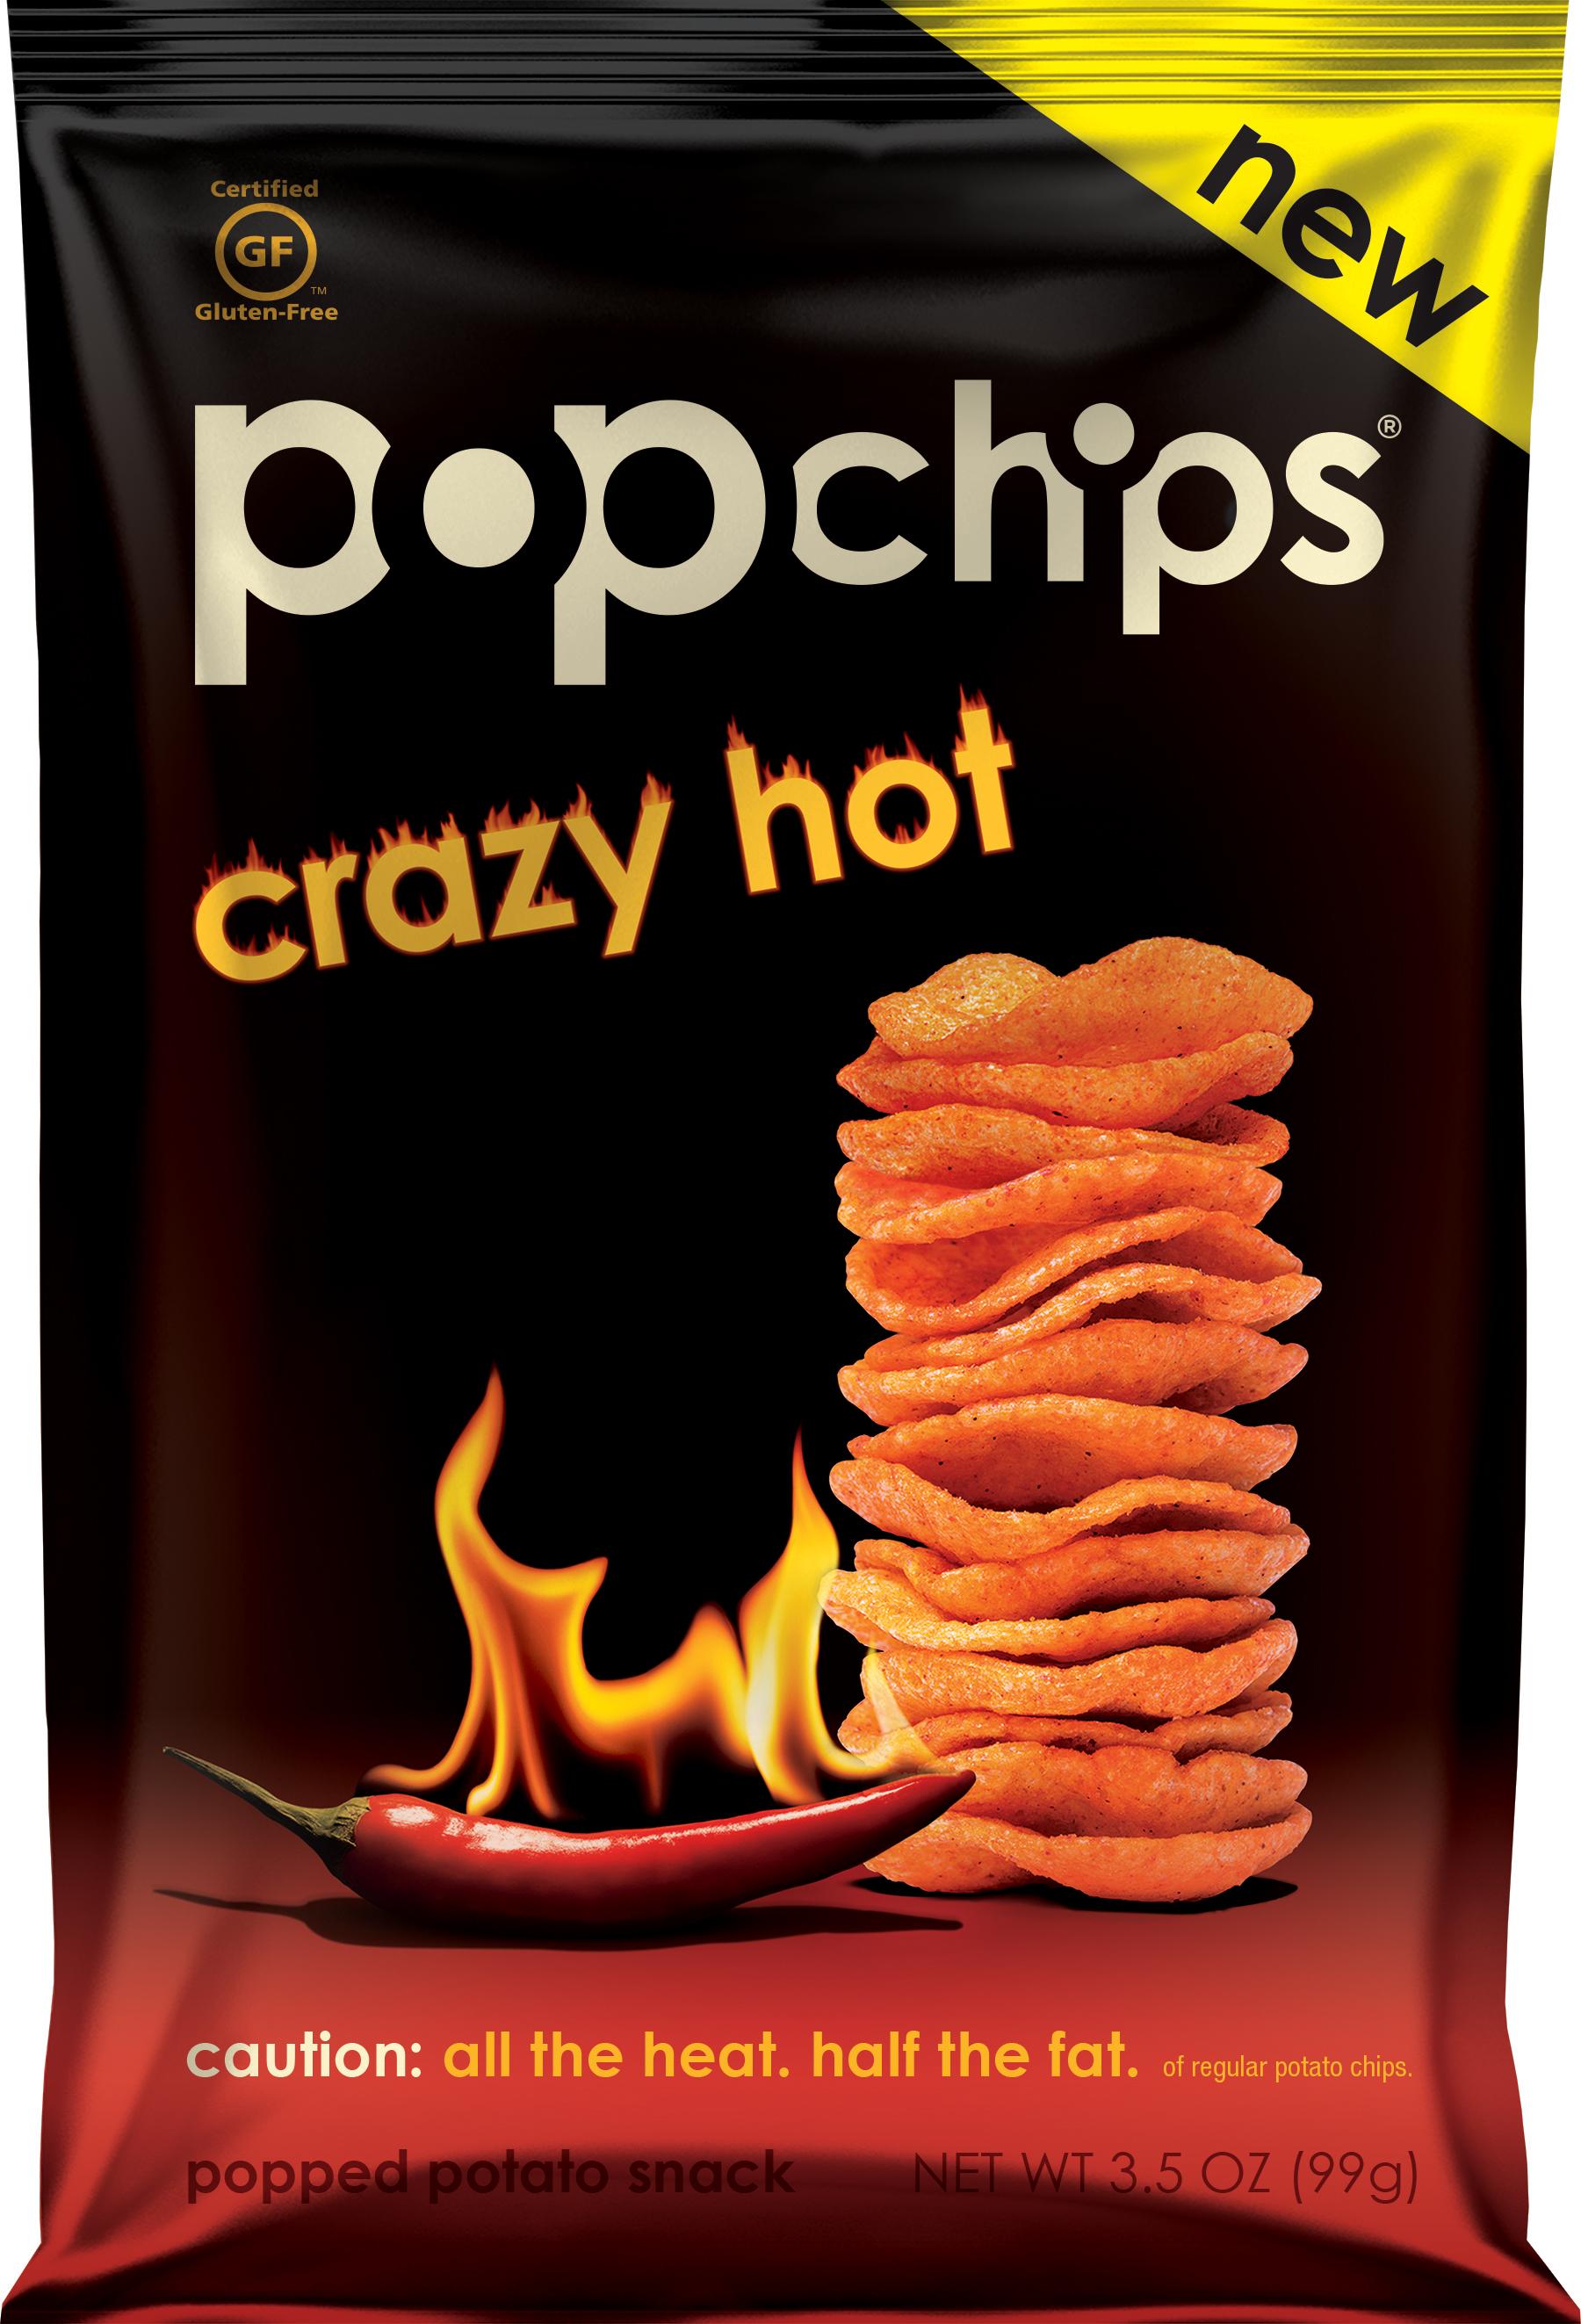 popchips Popped Potato Snack Crazy Hot